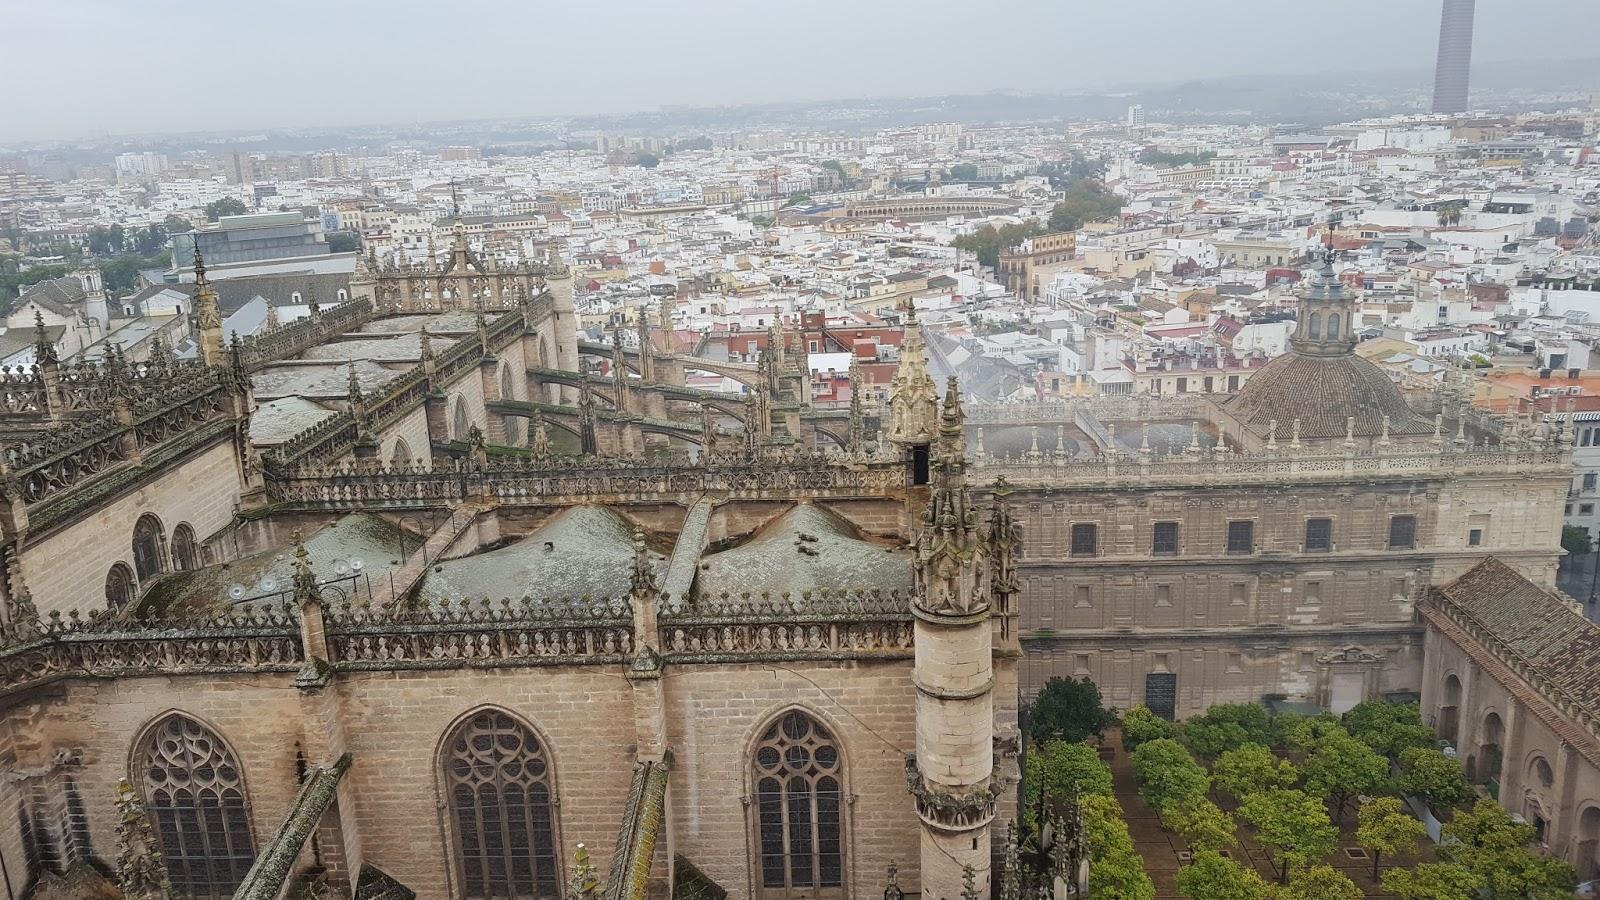 seville cathedral, giralda 풍향계에 대한 이미지 검색결과